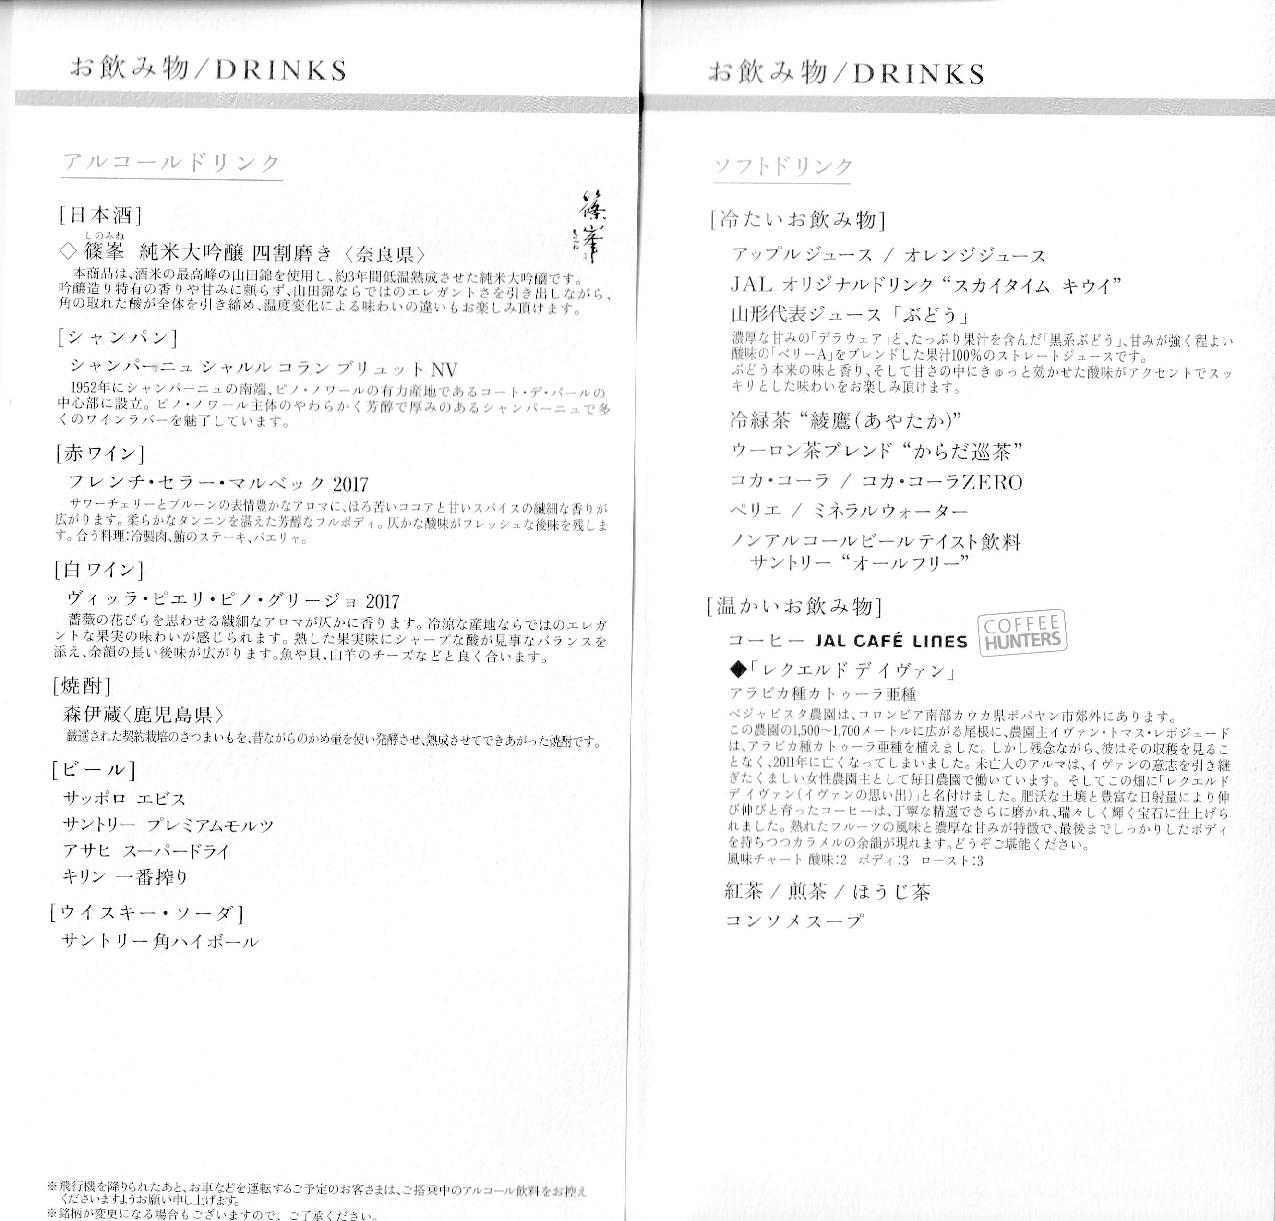 jl_menu_4